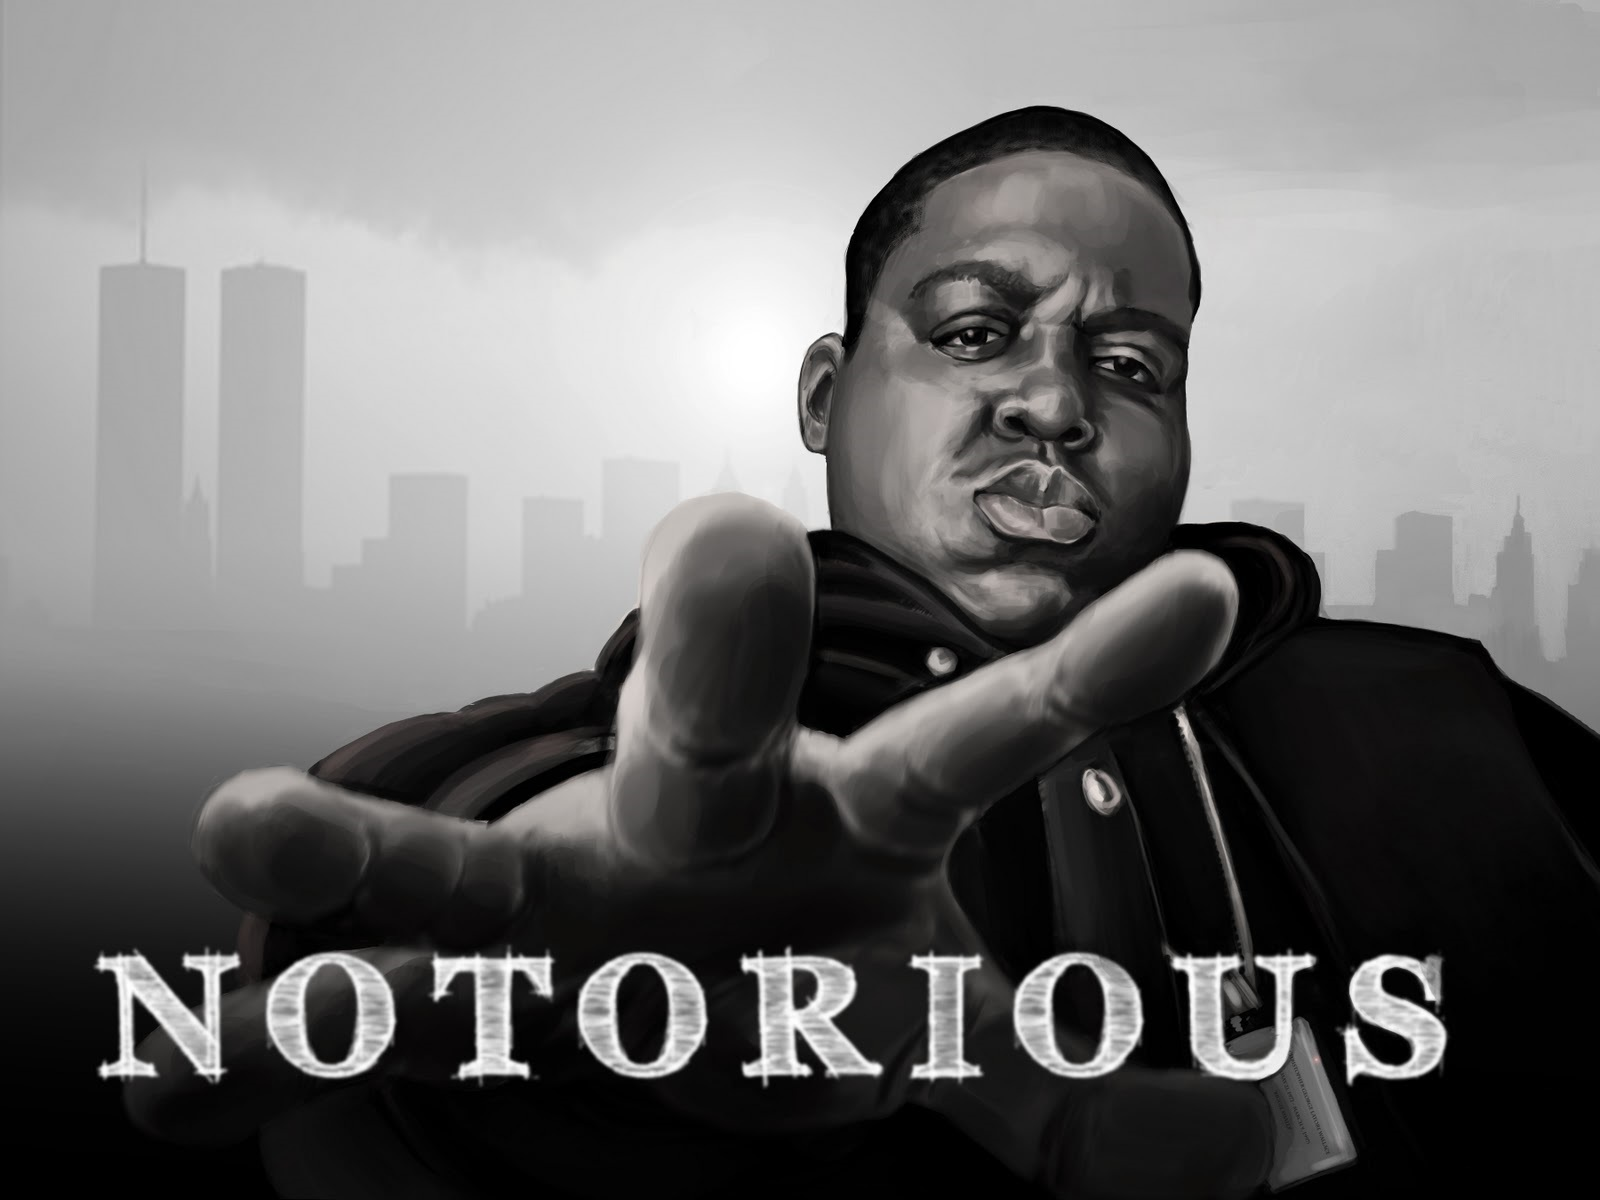 The Notorious B.I.G Computer Wallpaper